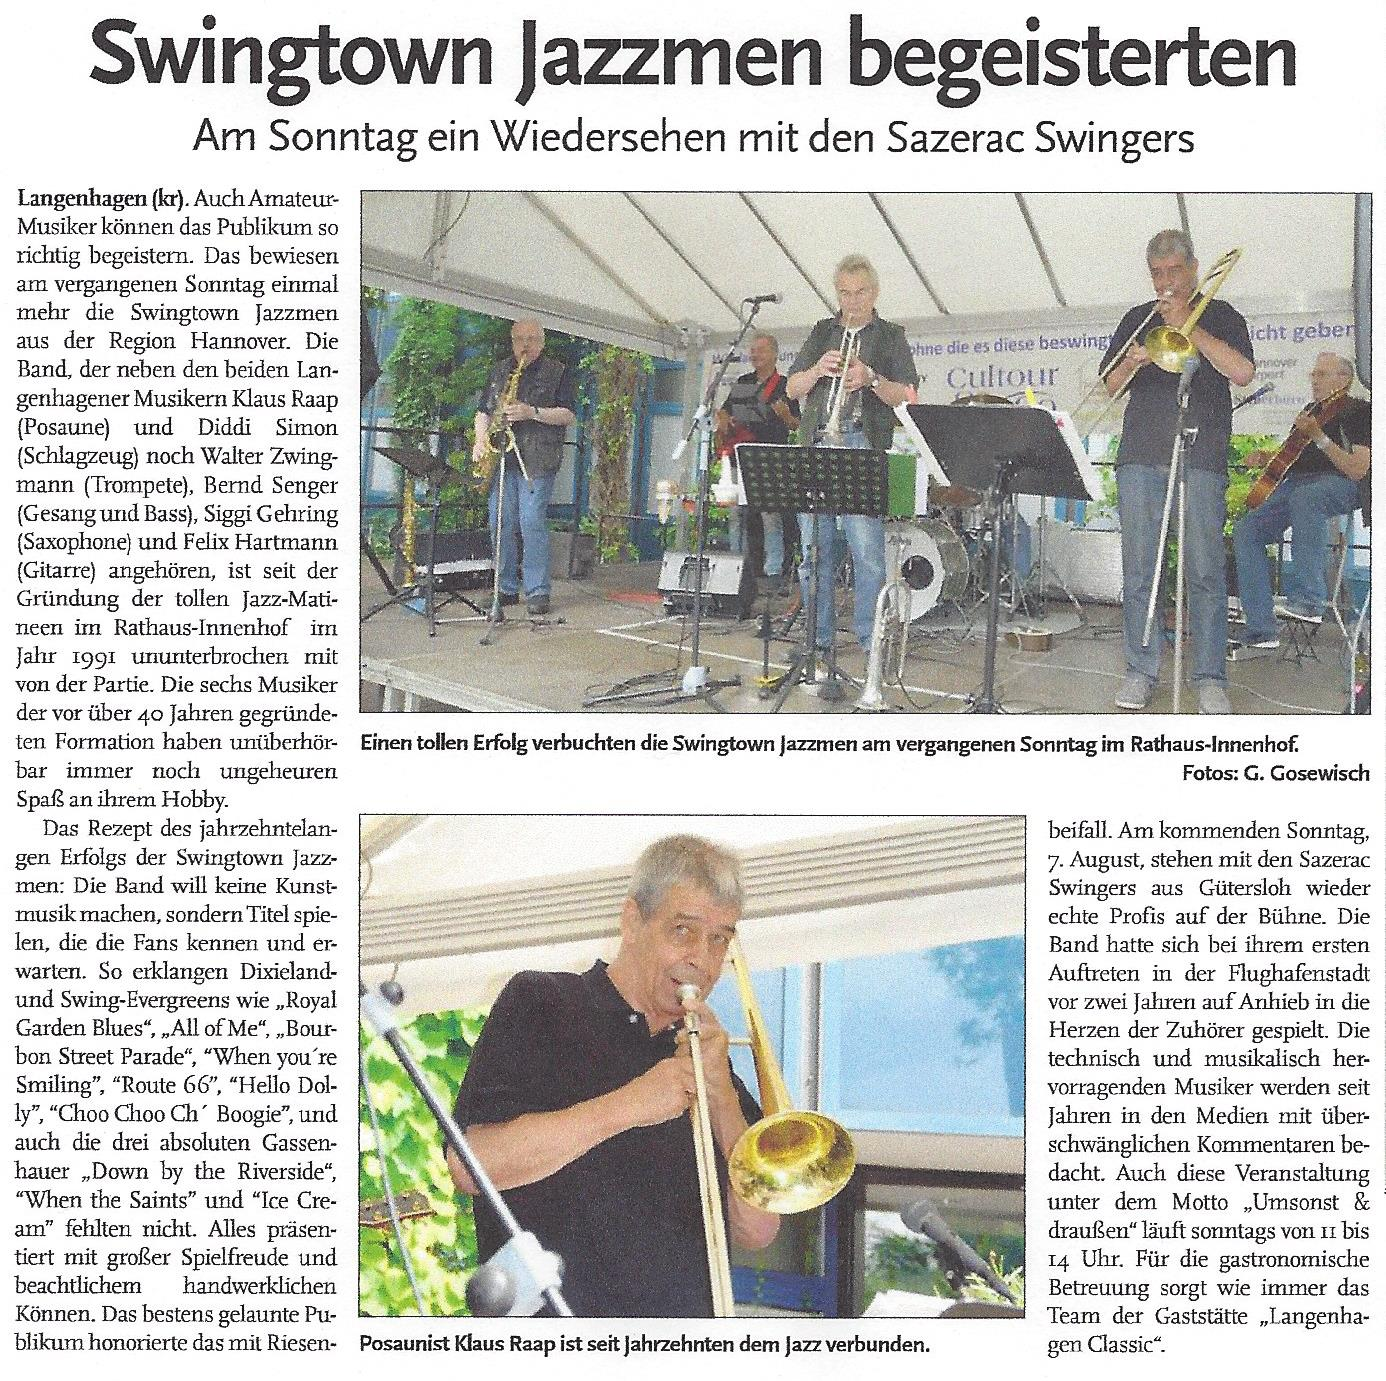 Swingtown Jazzmen begeistern